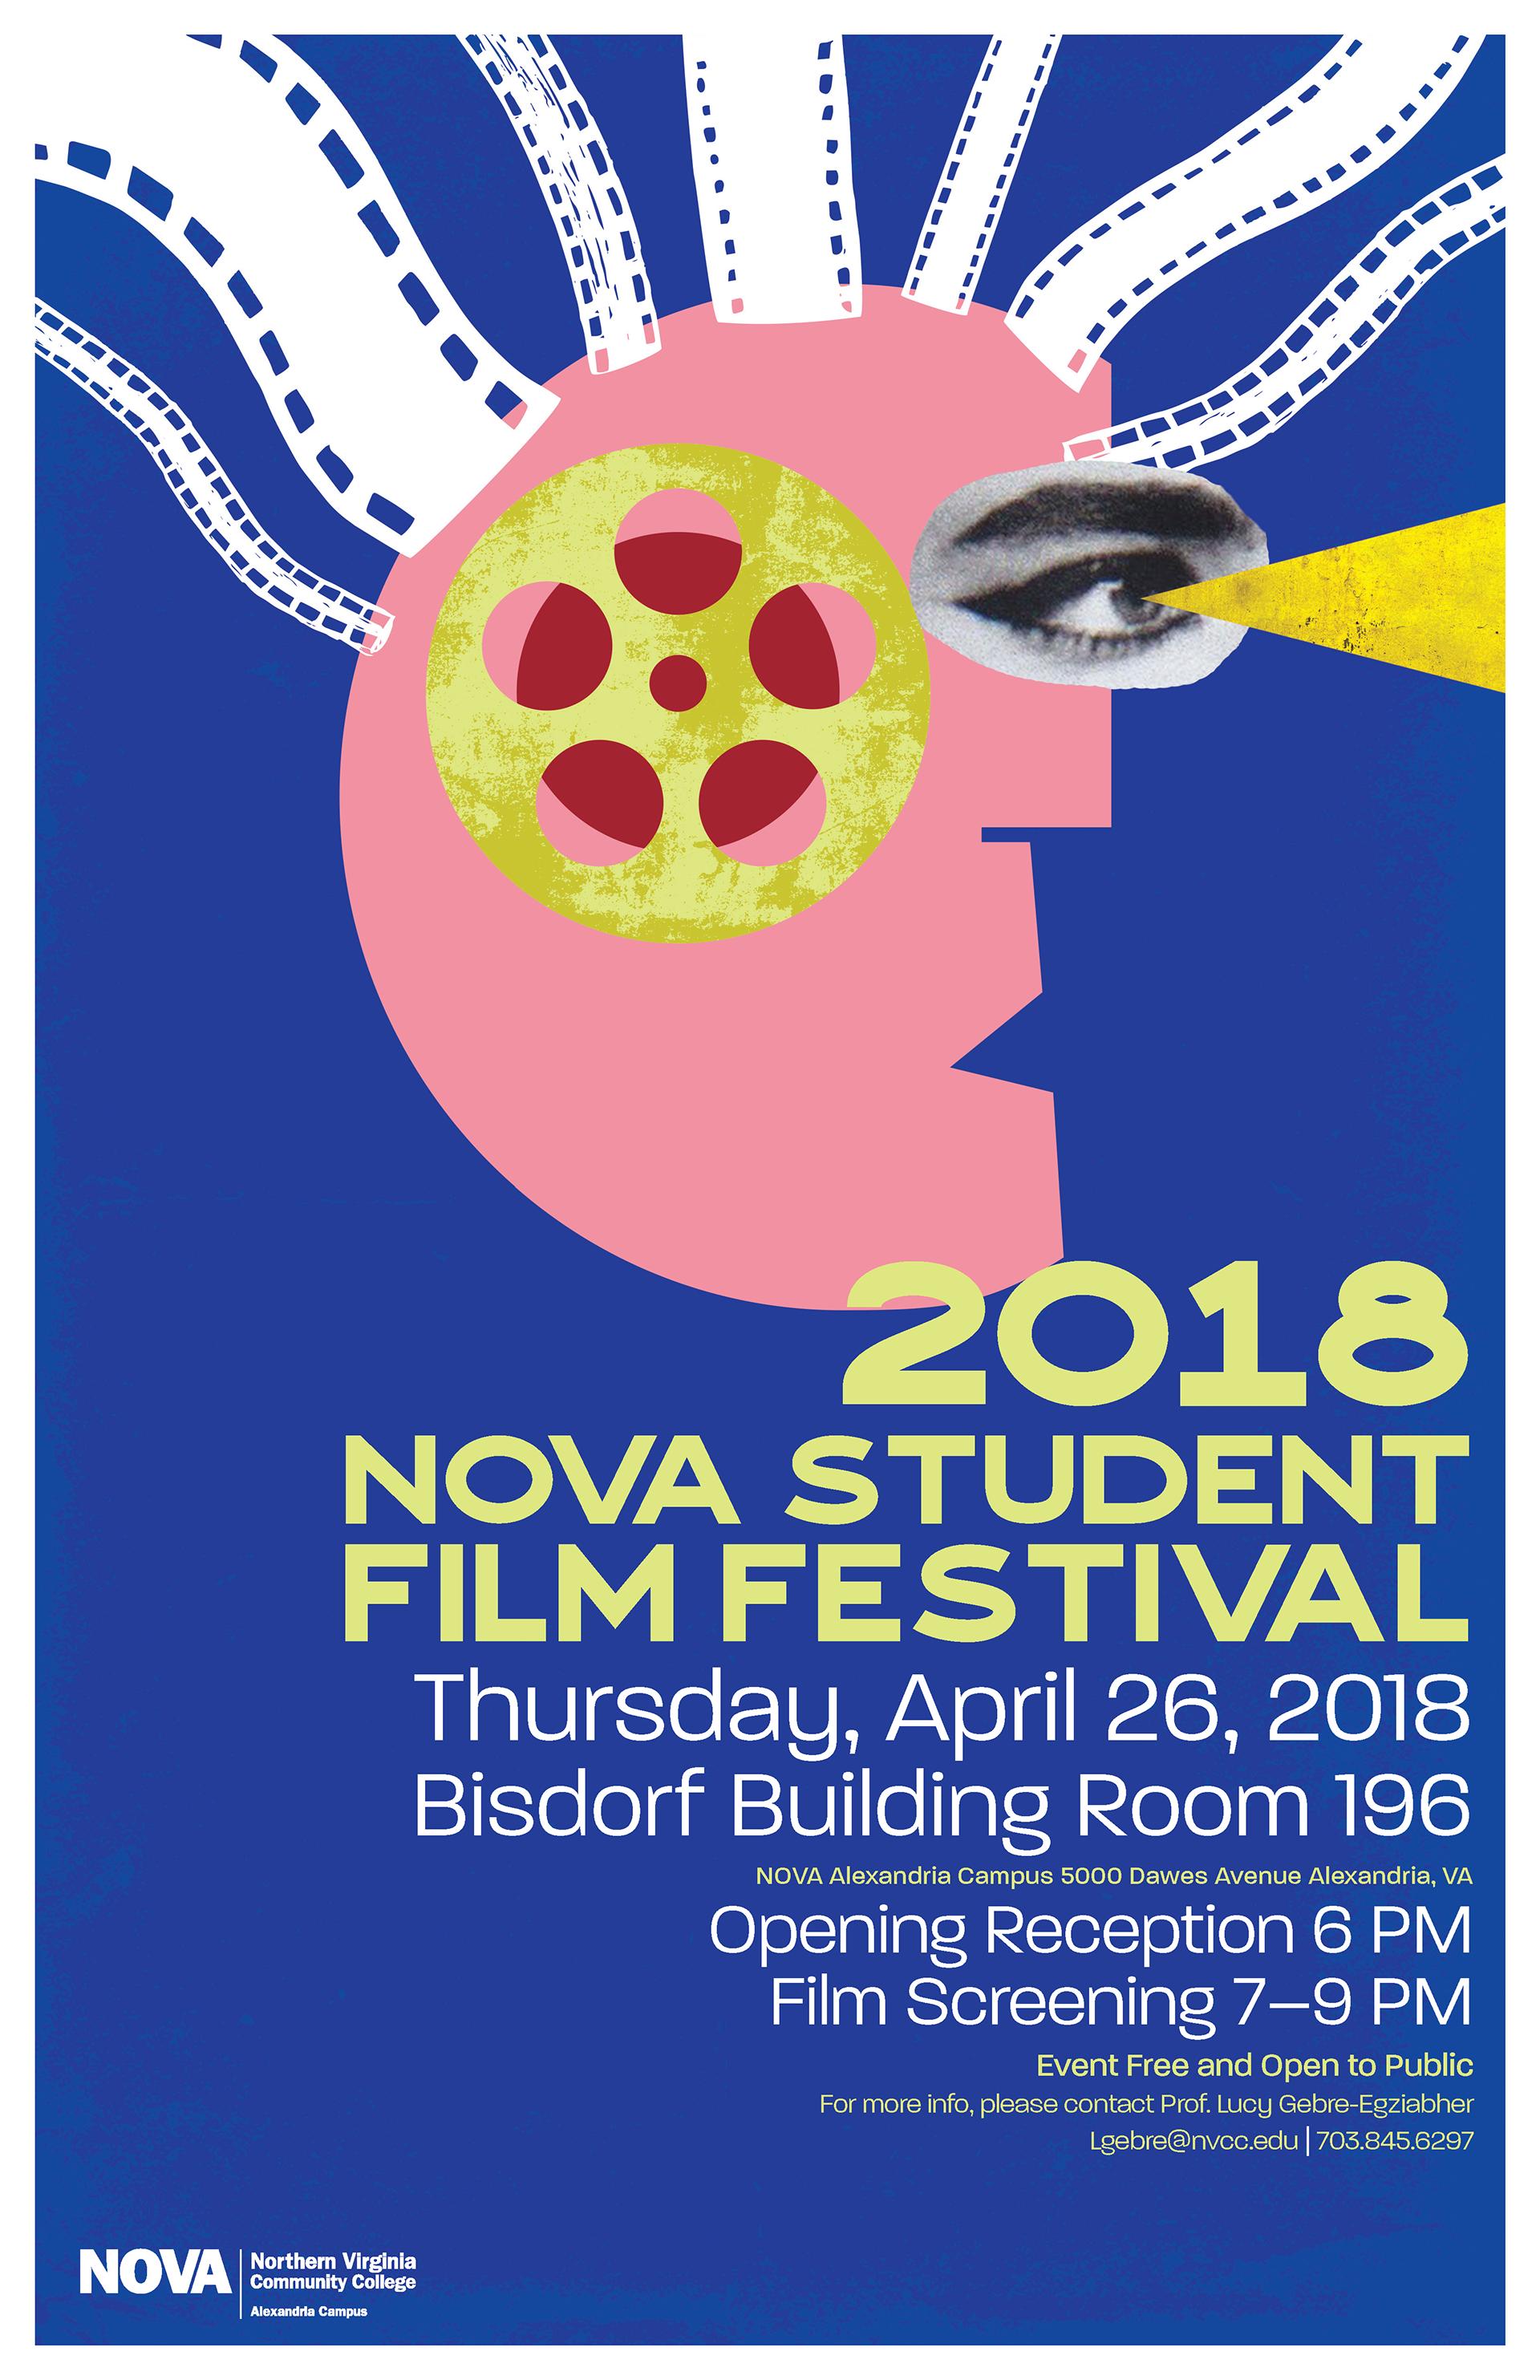 2018 NOVA Student Film Festival Poster